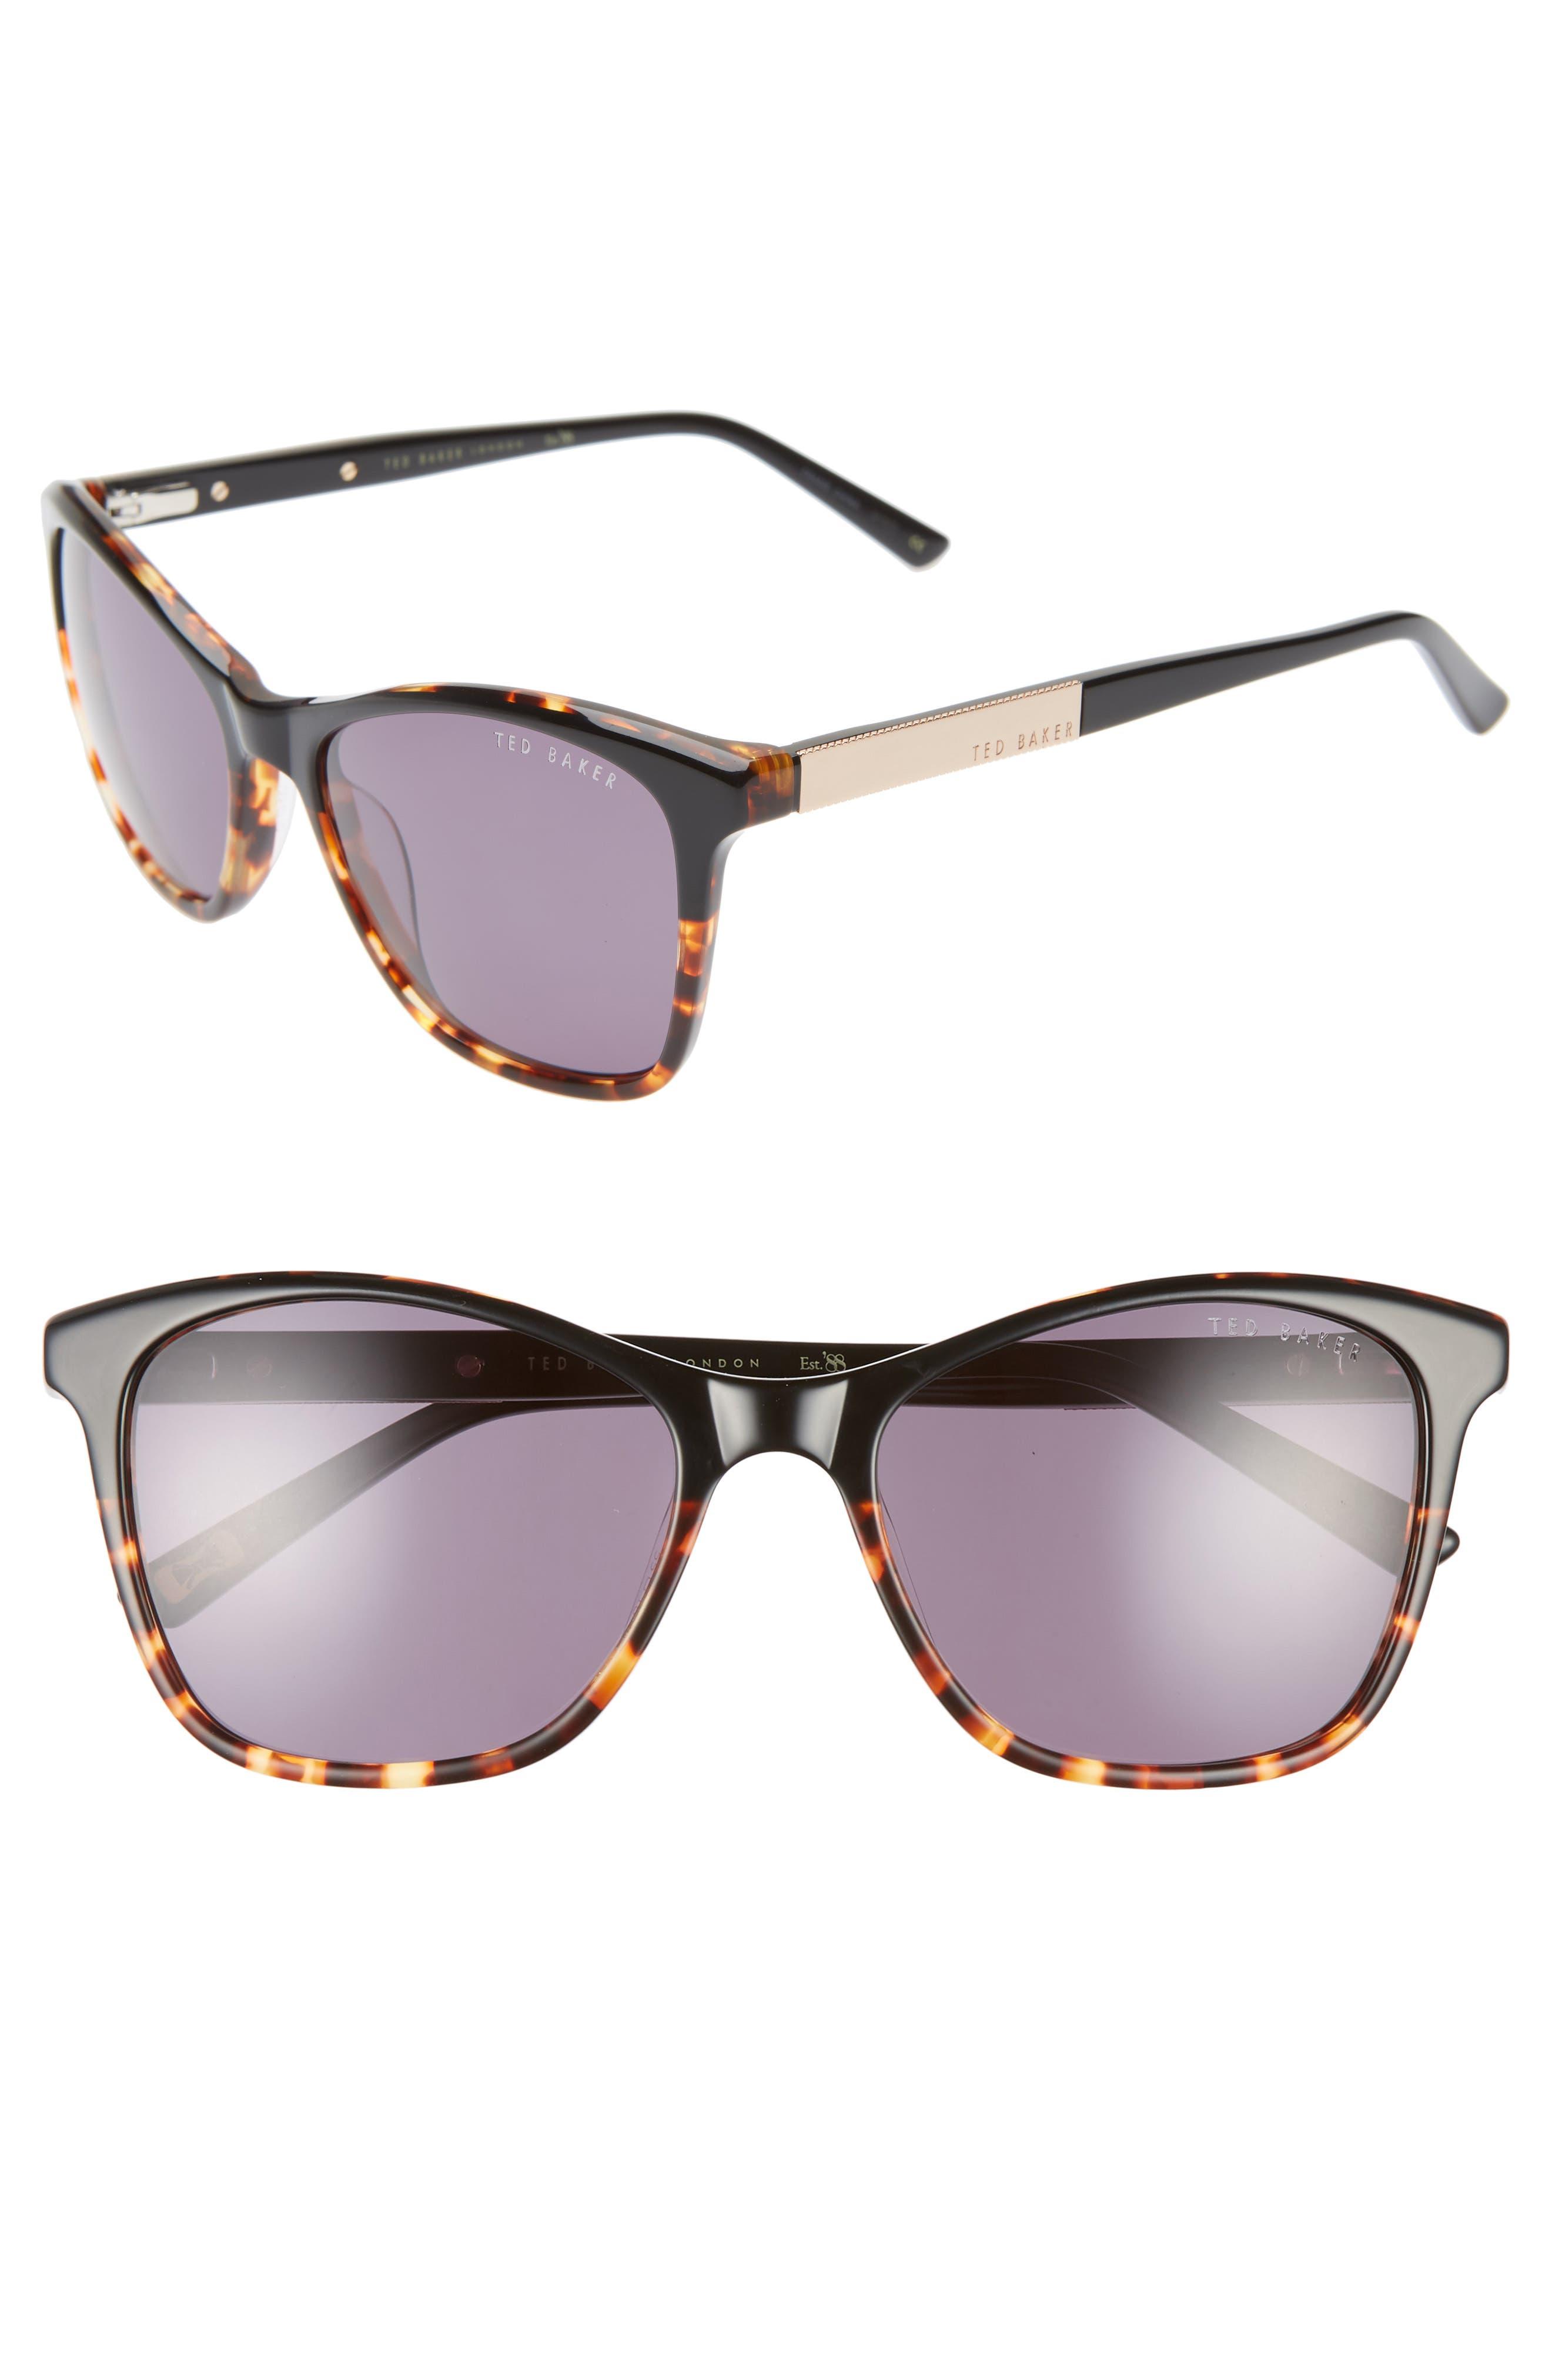 TED BAKER LONDON 55mm Square Cat Eye Sunglasses, Main, color, BLACK HAVANA/ GOLD/ PURPLE